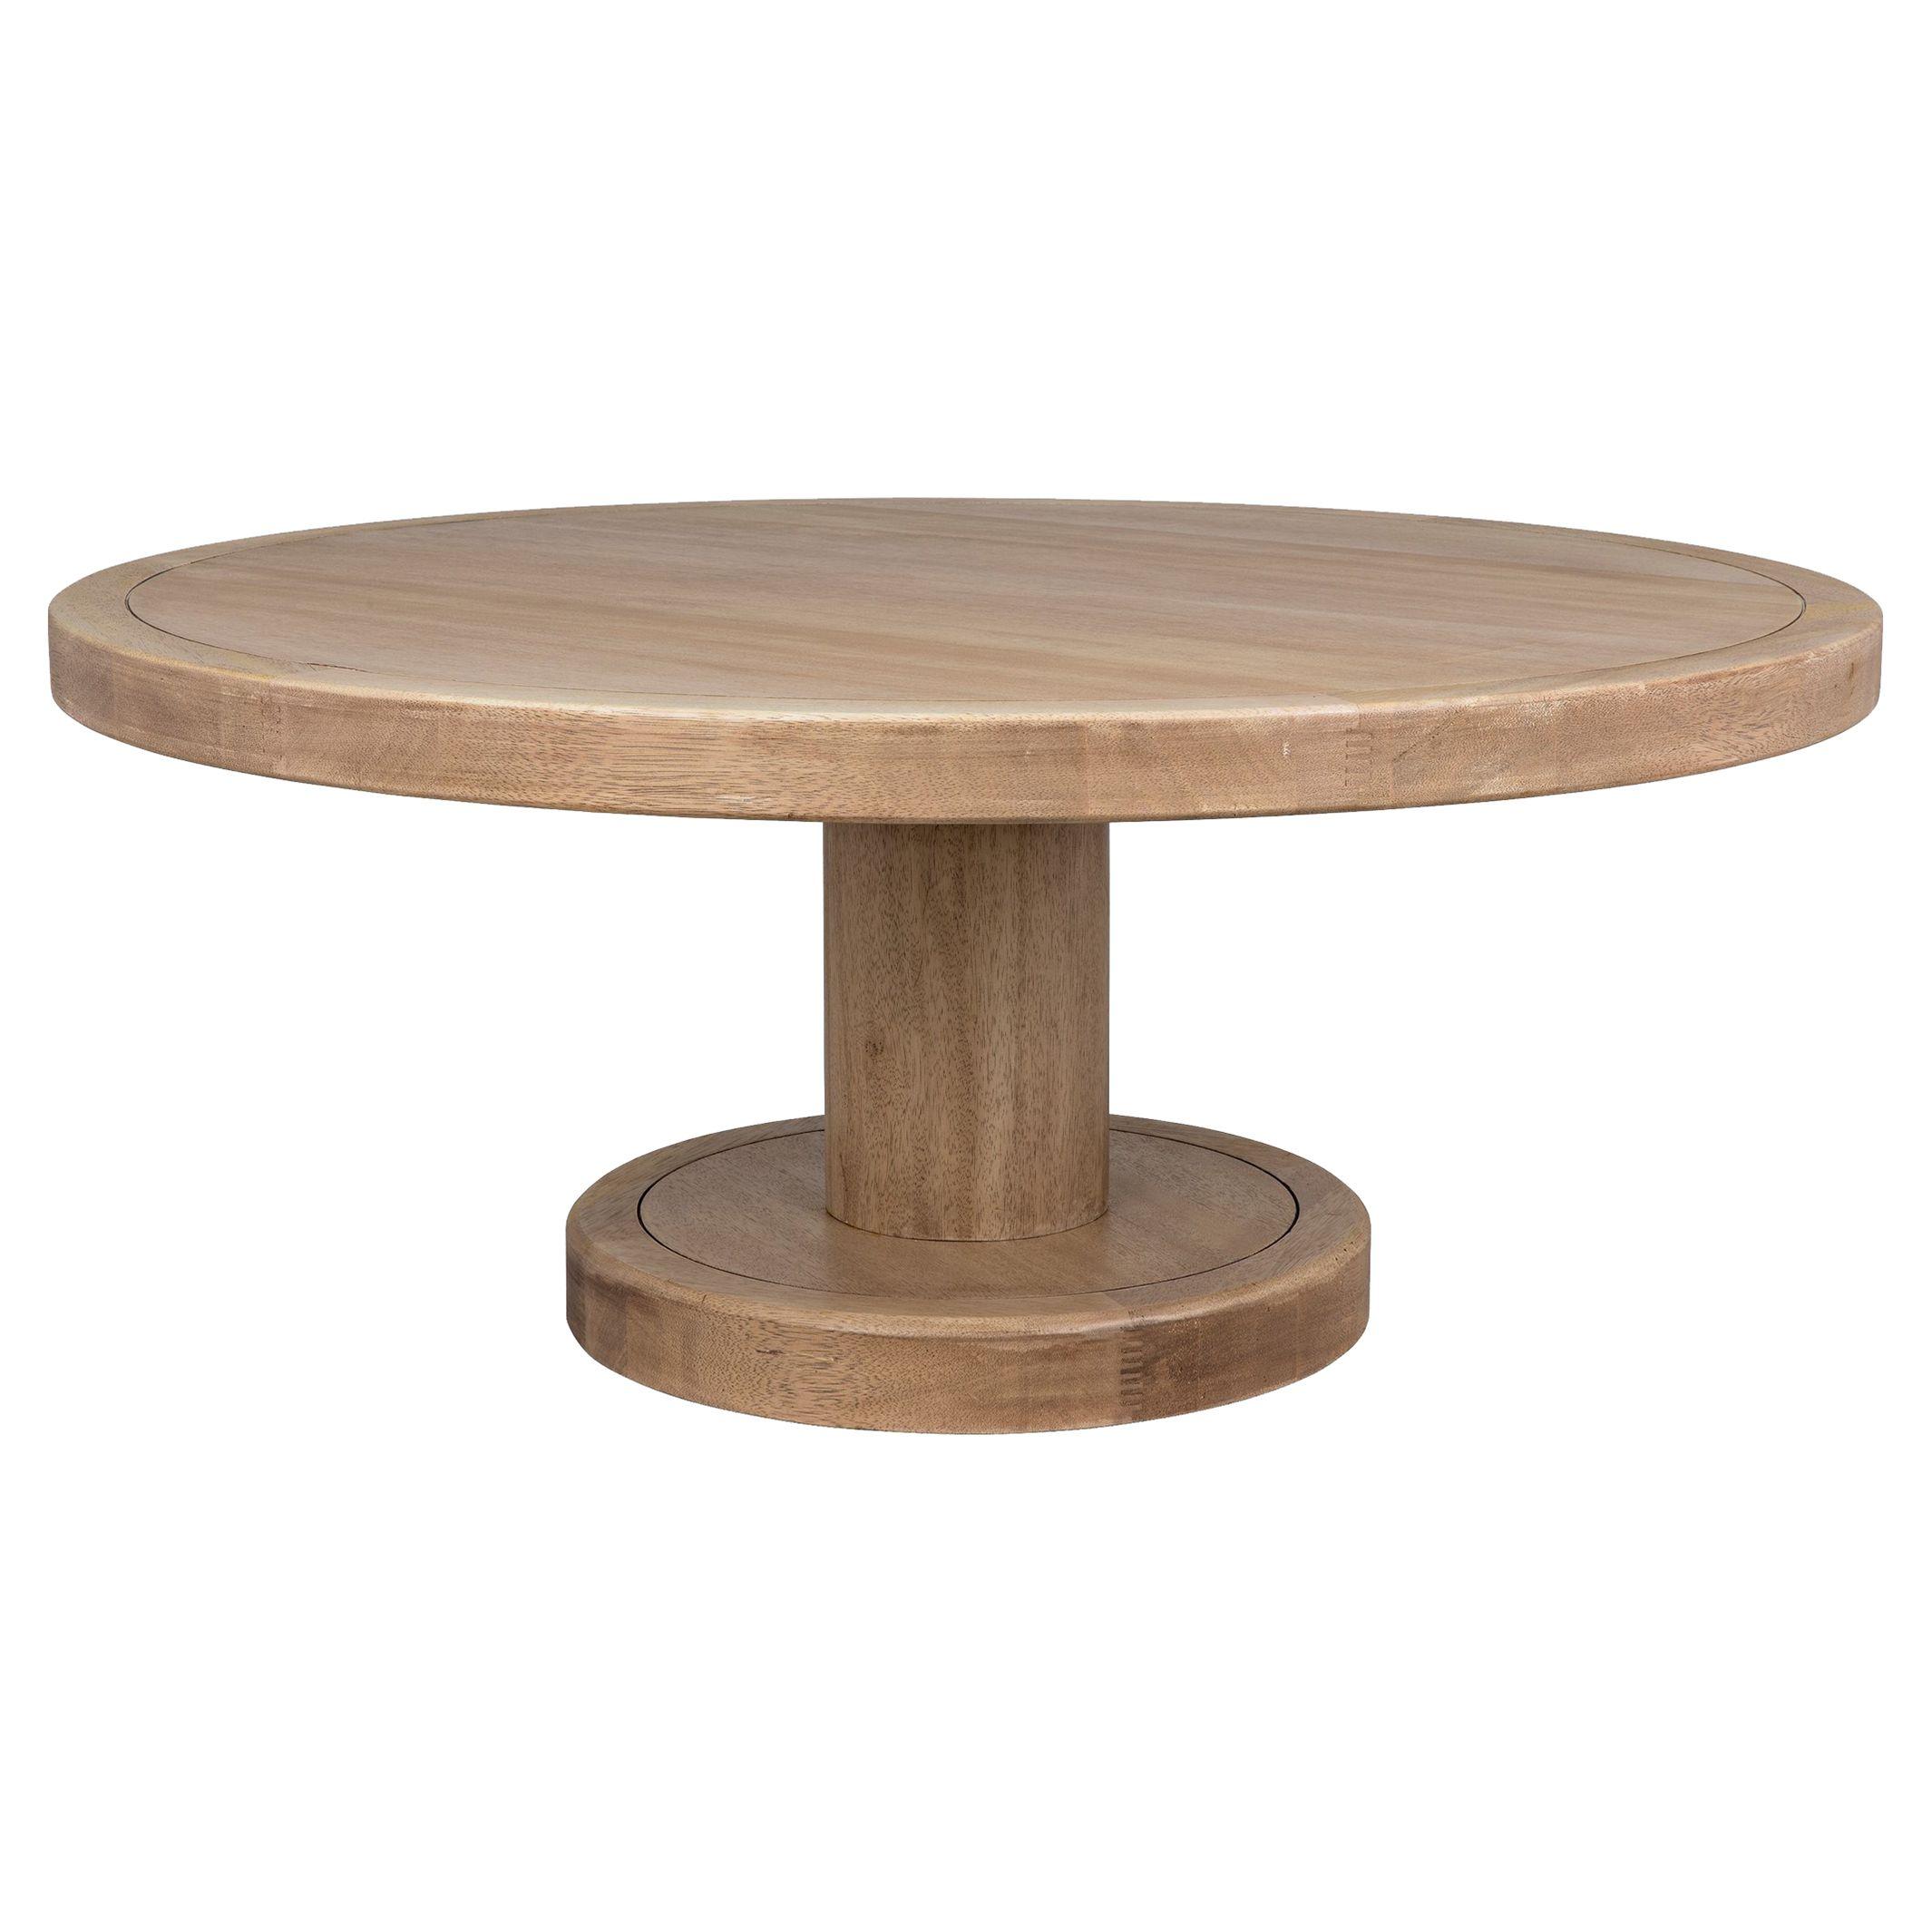 Noir Milena Modern Classic Brown Wood Round Round Coffee Table Coffee Table Walnut Coffee Table Round Coffee Table [ 2130 x 2130 Pixel ]